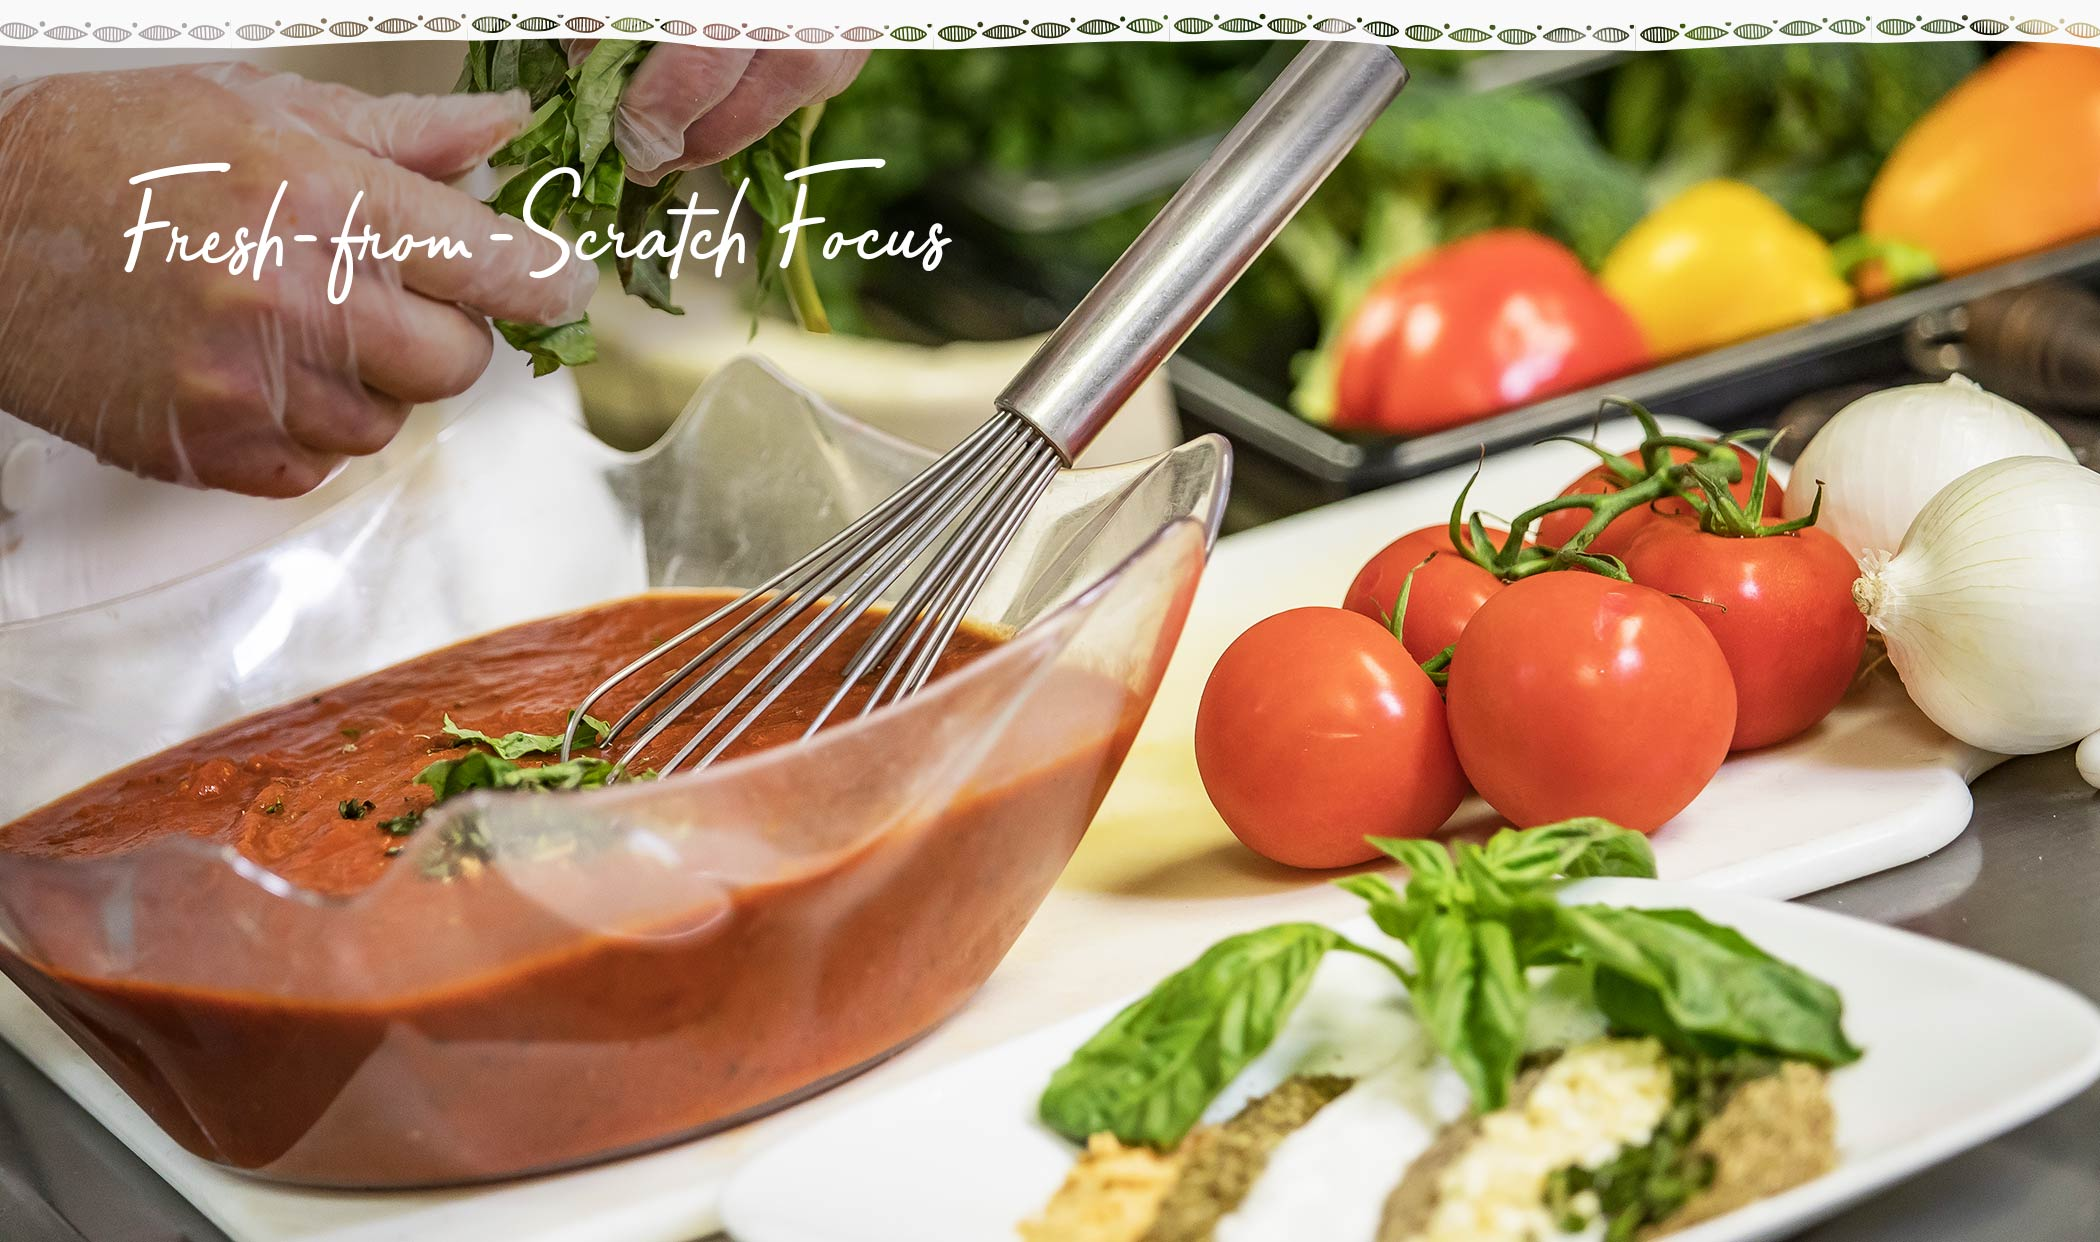 Fresh from Scratch Focus